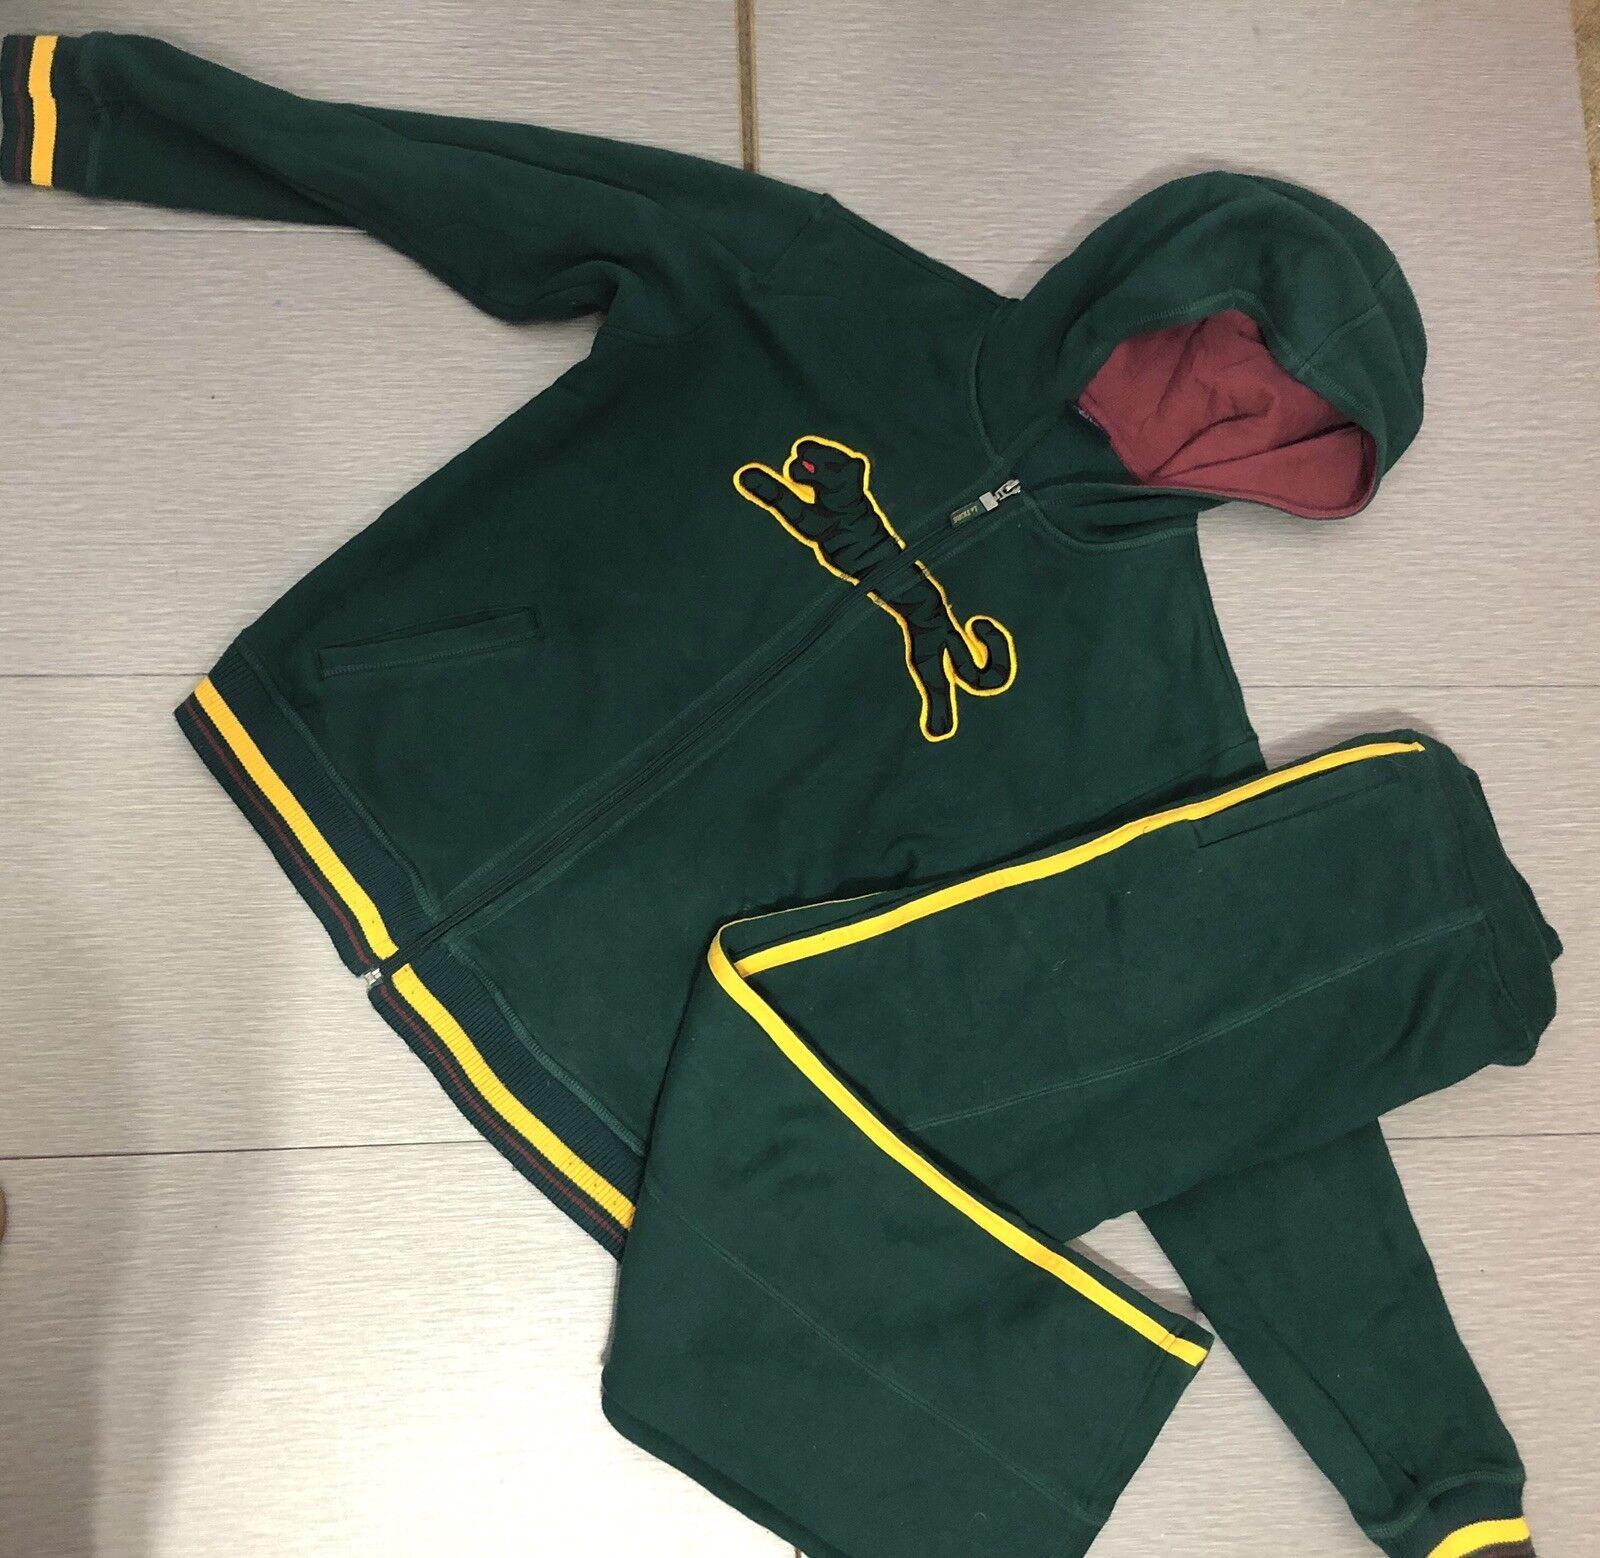 1990's Womens Le Tigre Green J Sweatsuit Size M L